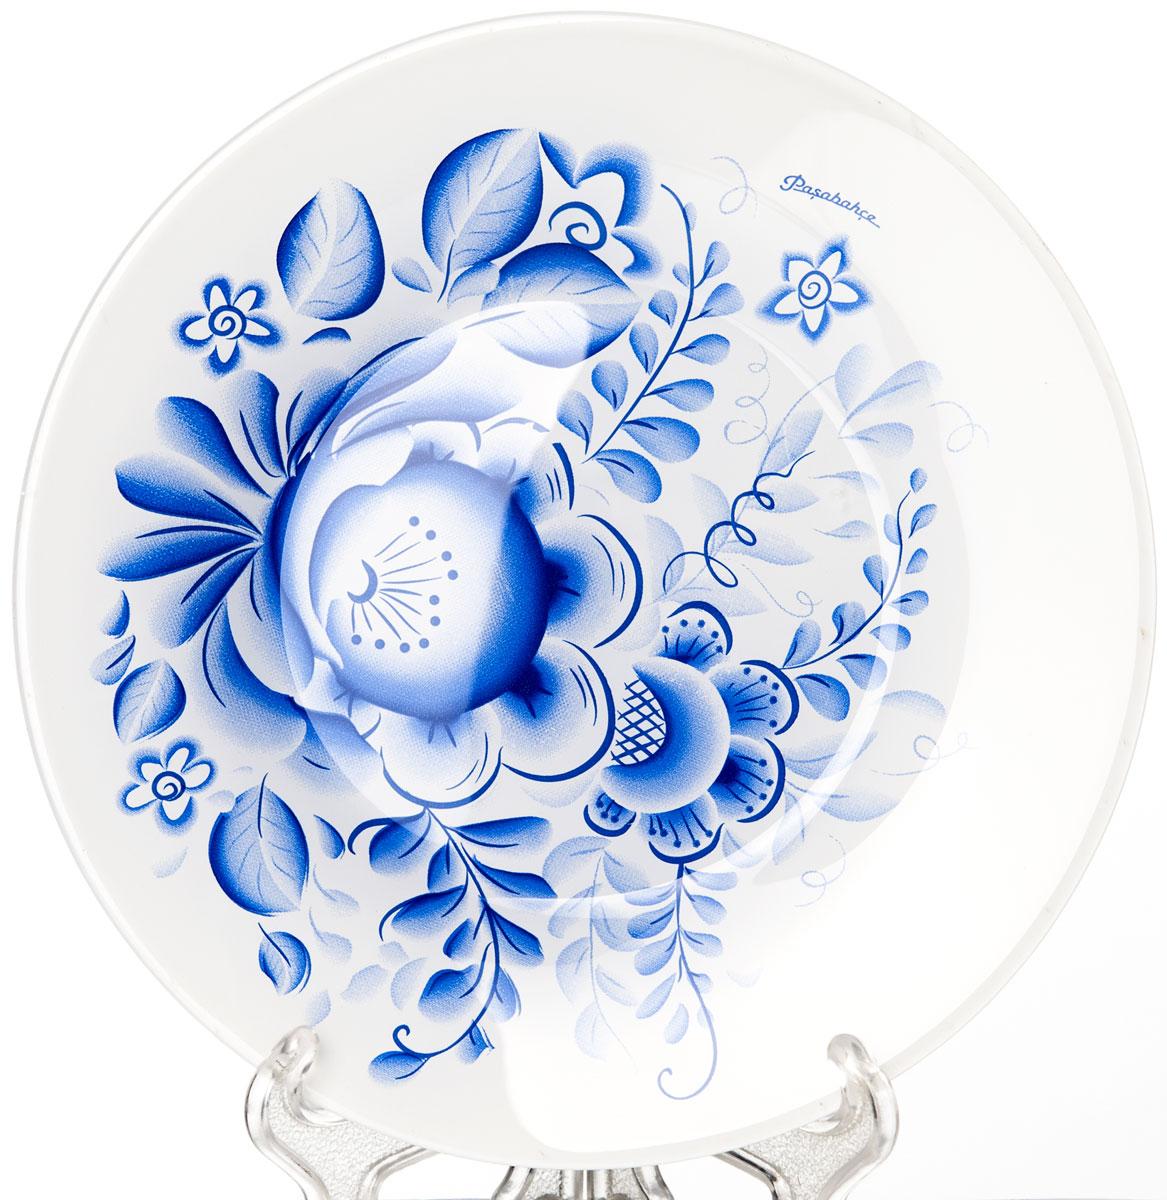 Тарелка Pasabahce Гжель, диаметр 19,5 см10327SLBD33Тарелка из упрочненного стекла d=195 мм, рисунок гжель